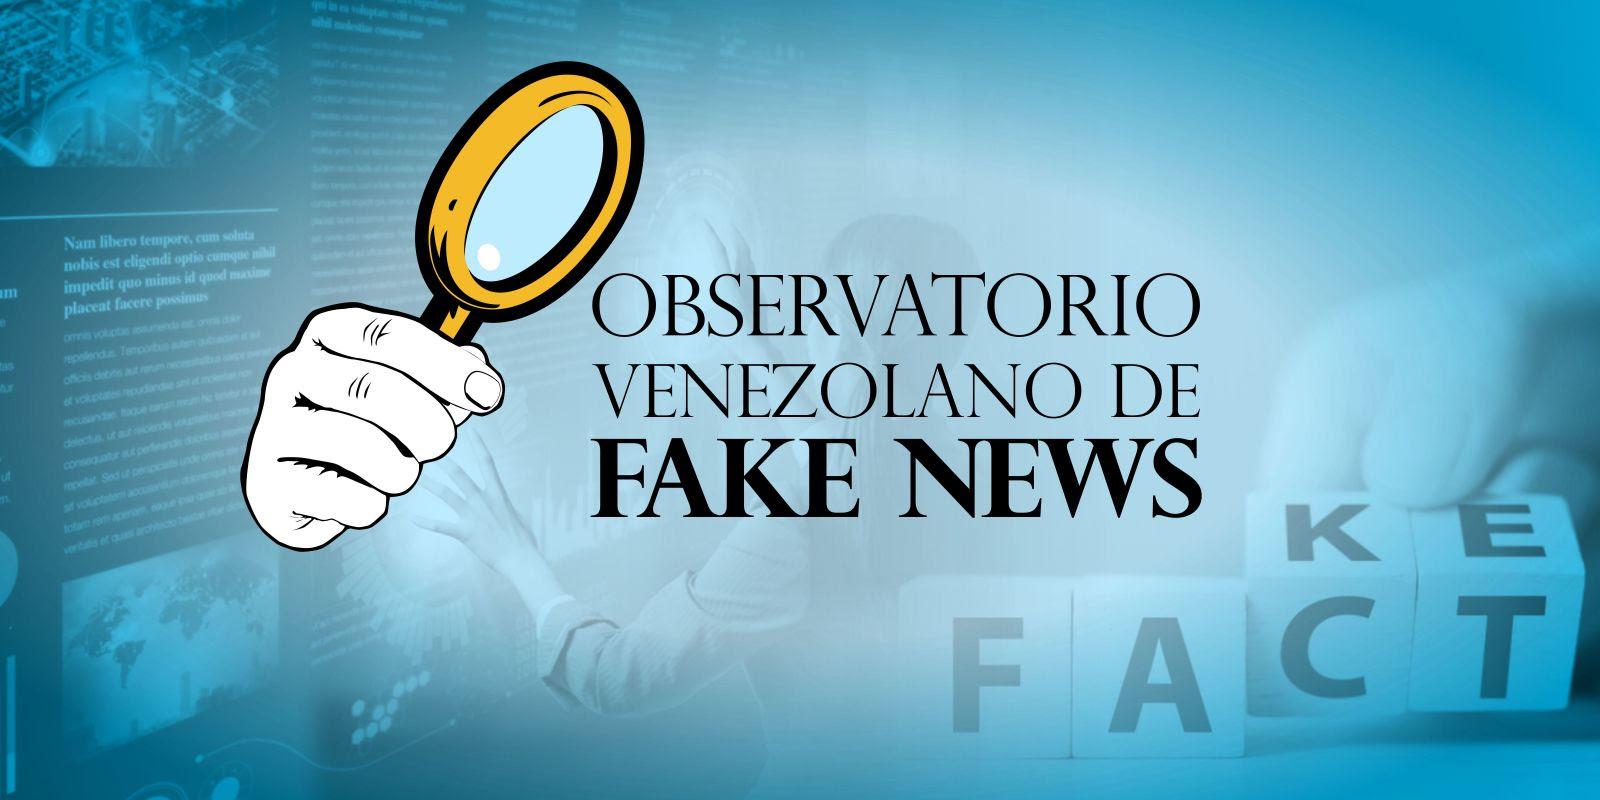 Nace el Observatorio Venezolano de Fake News